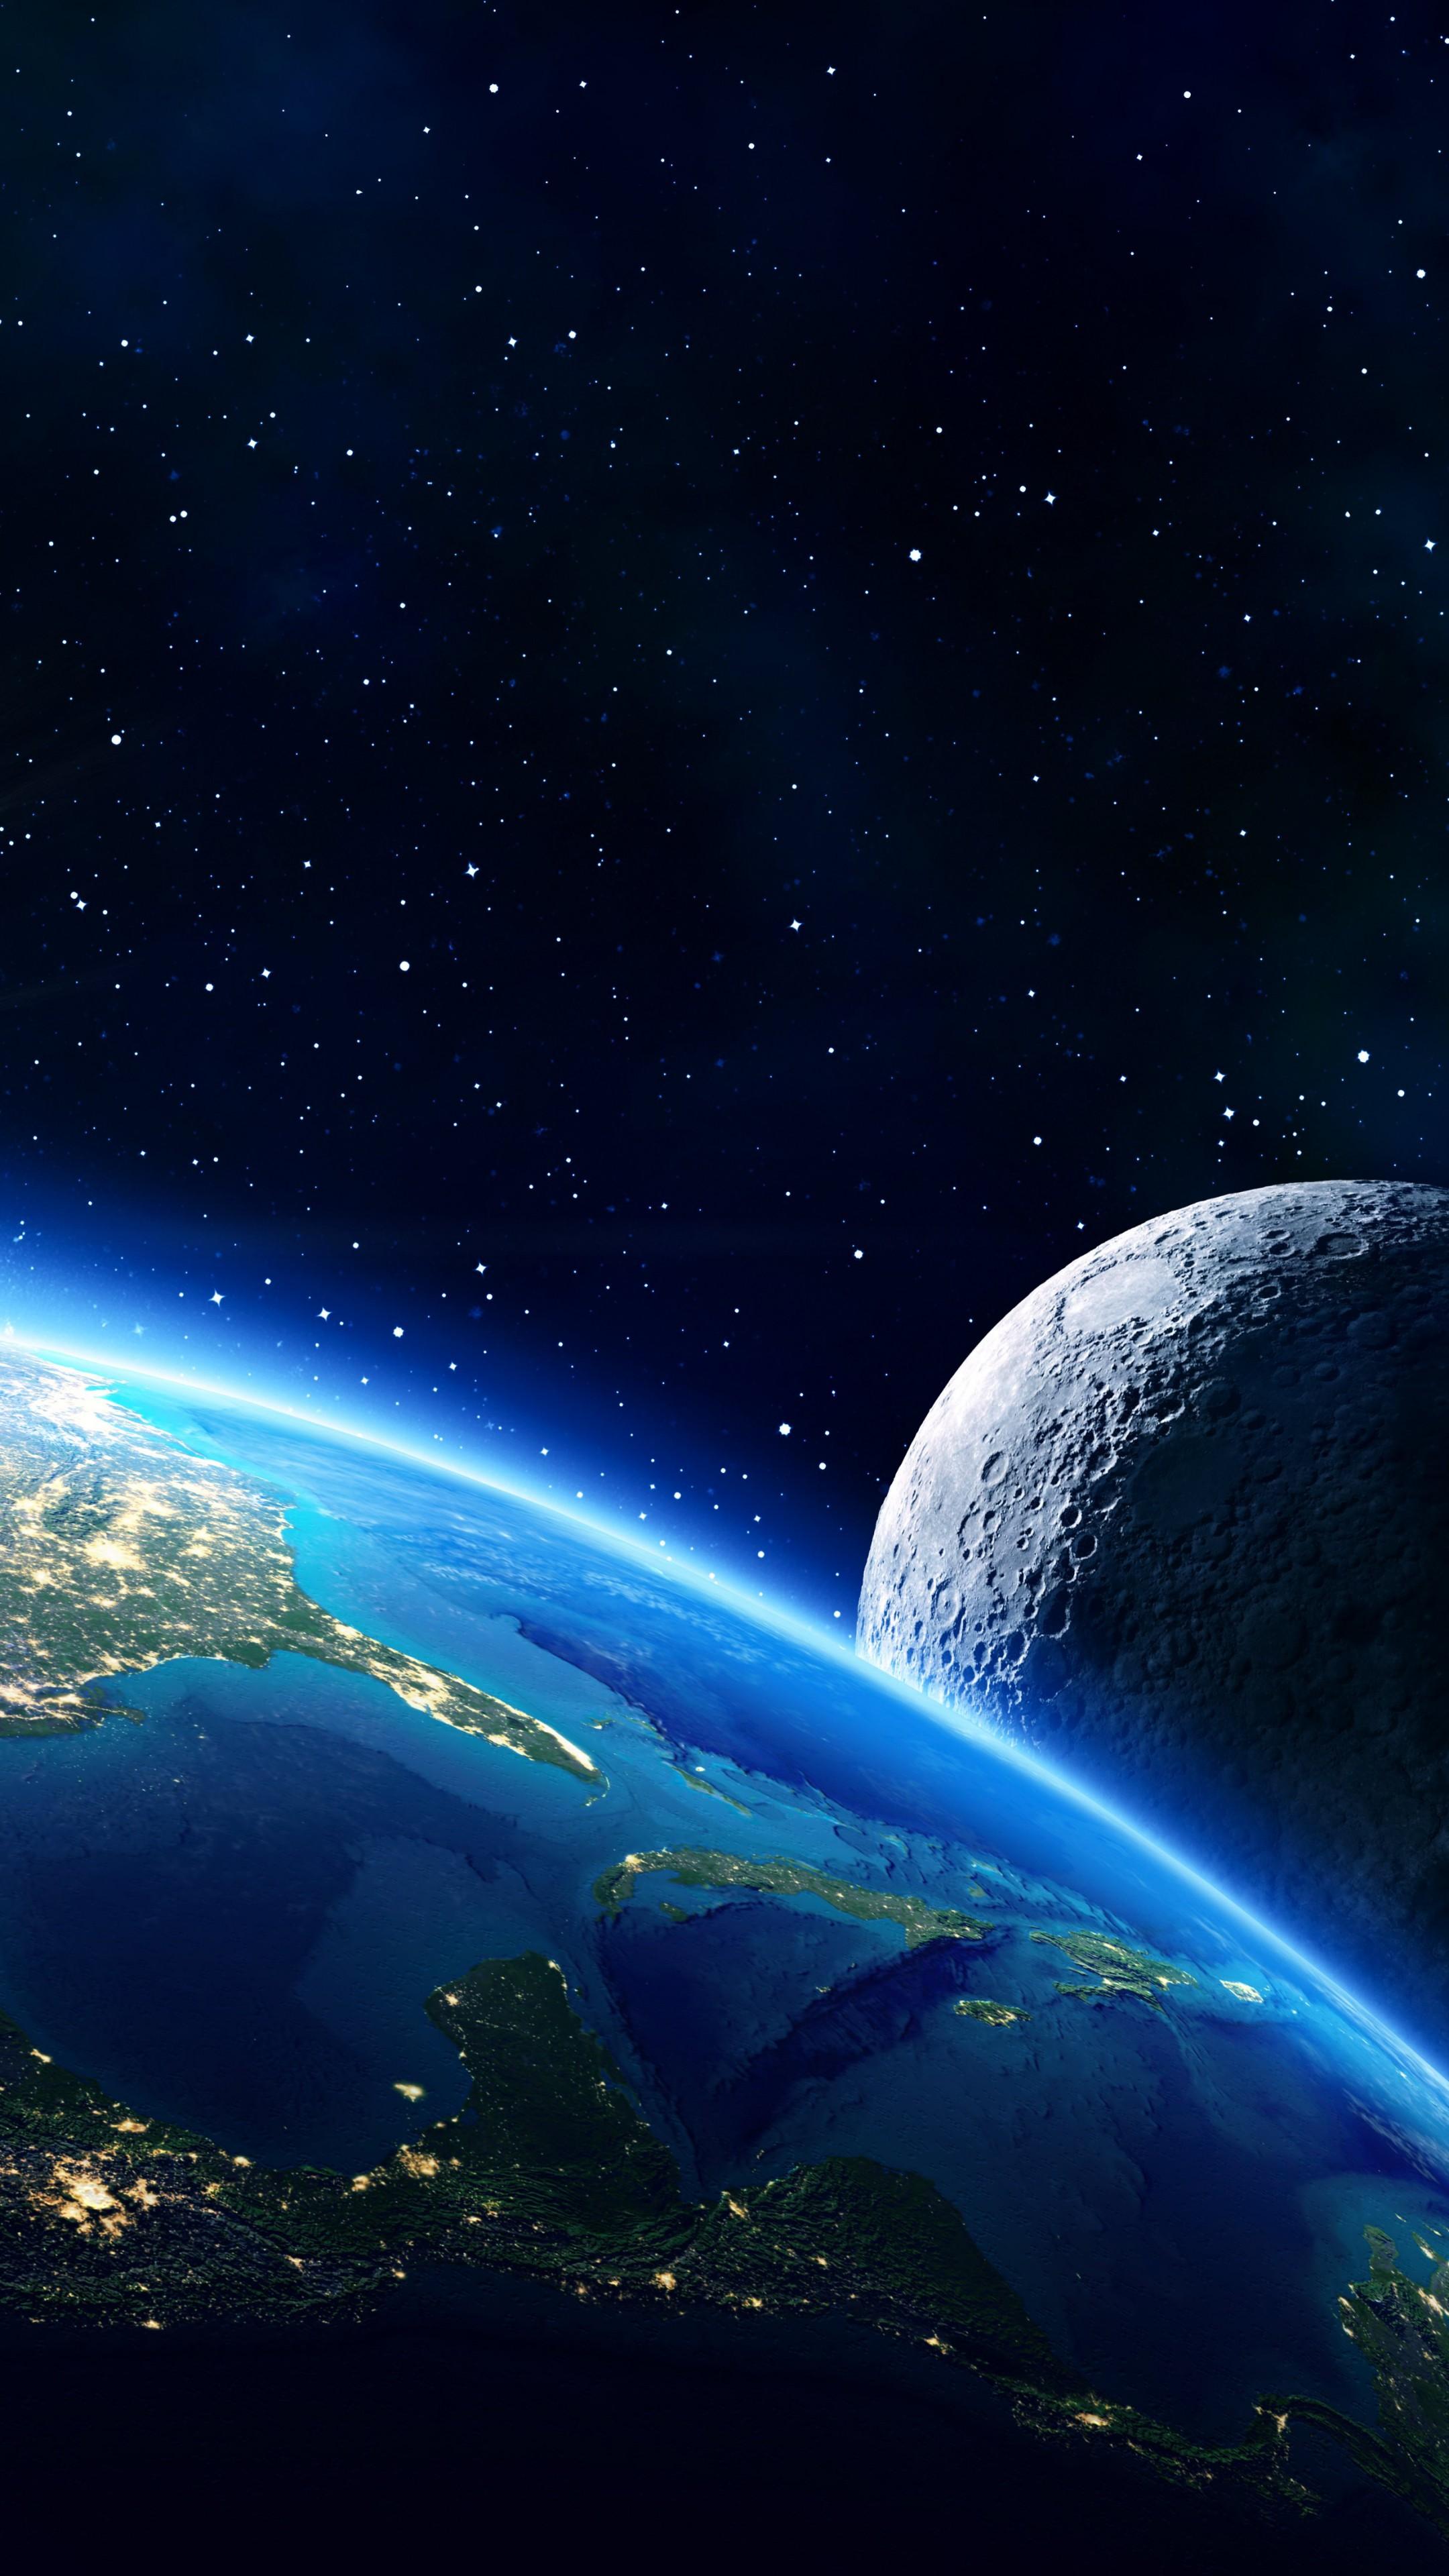 Wallpaper Earth, moon, planet, star, 5k, Space #16639